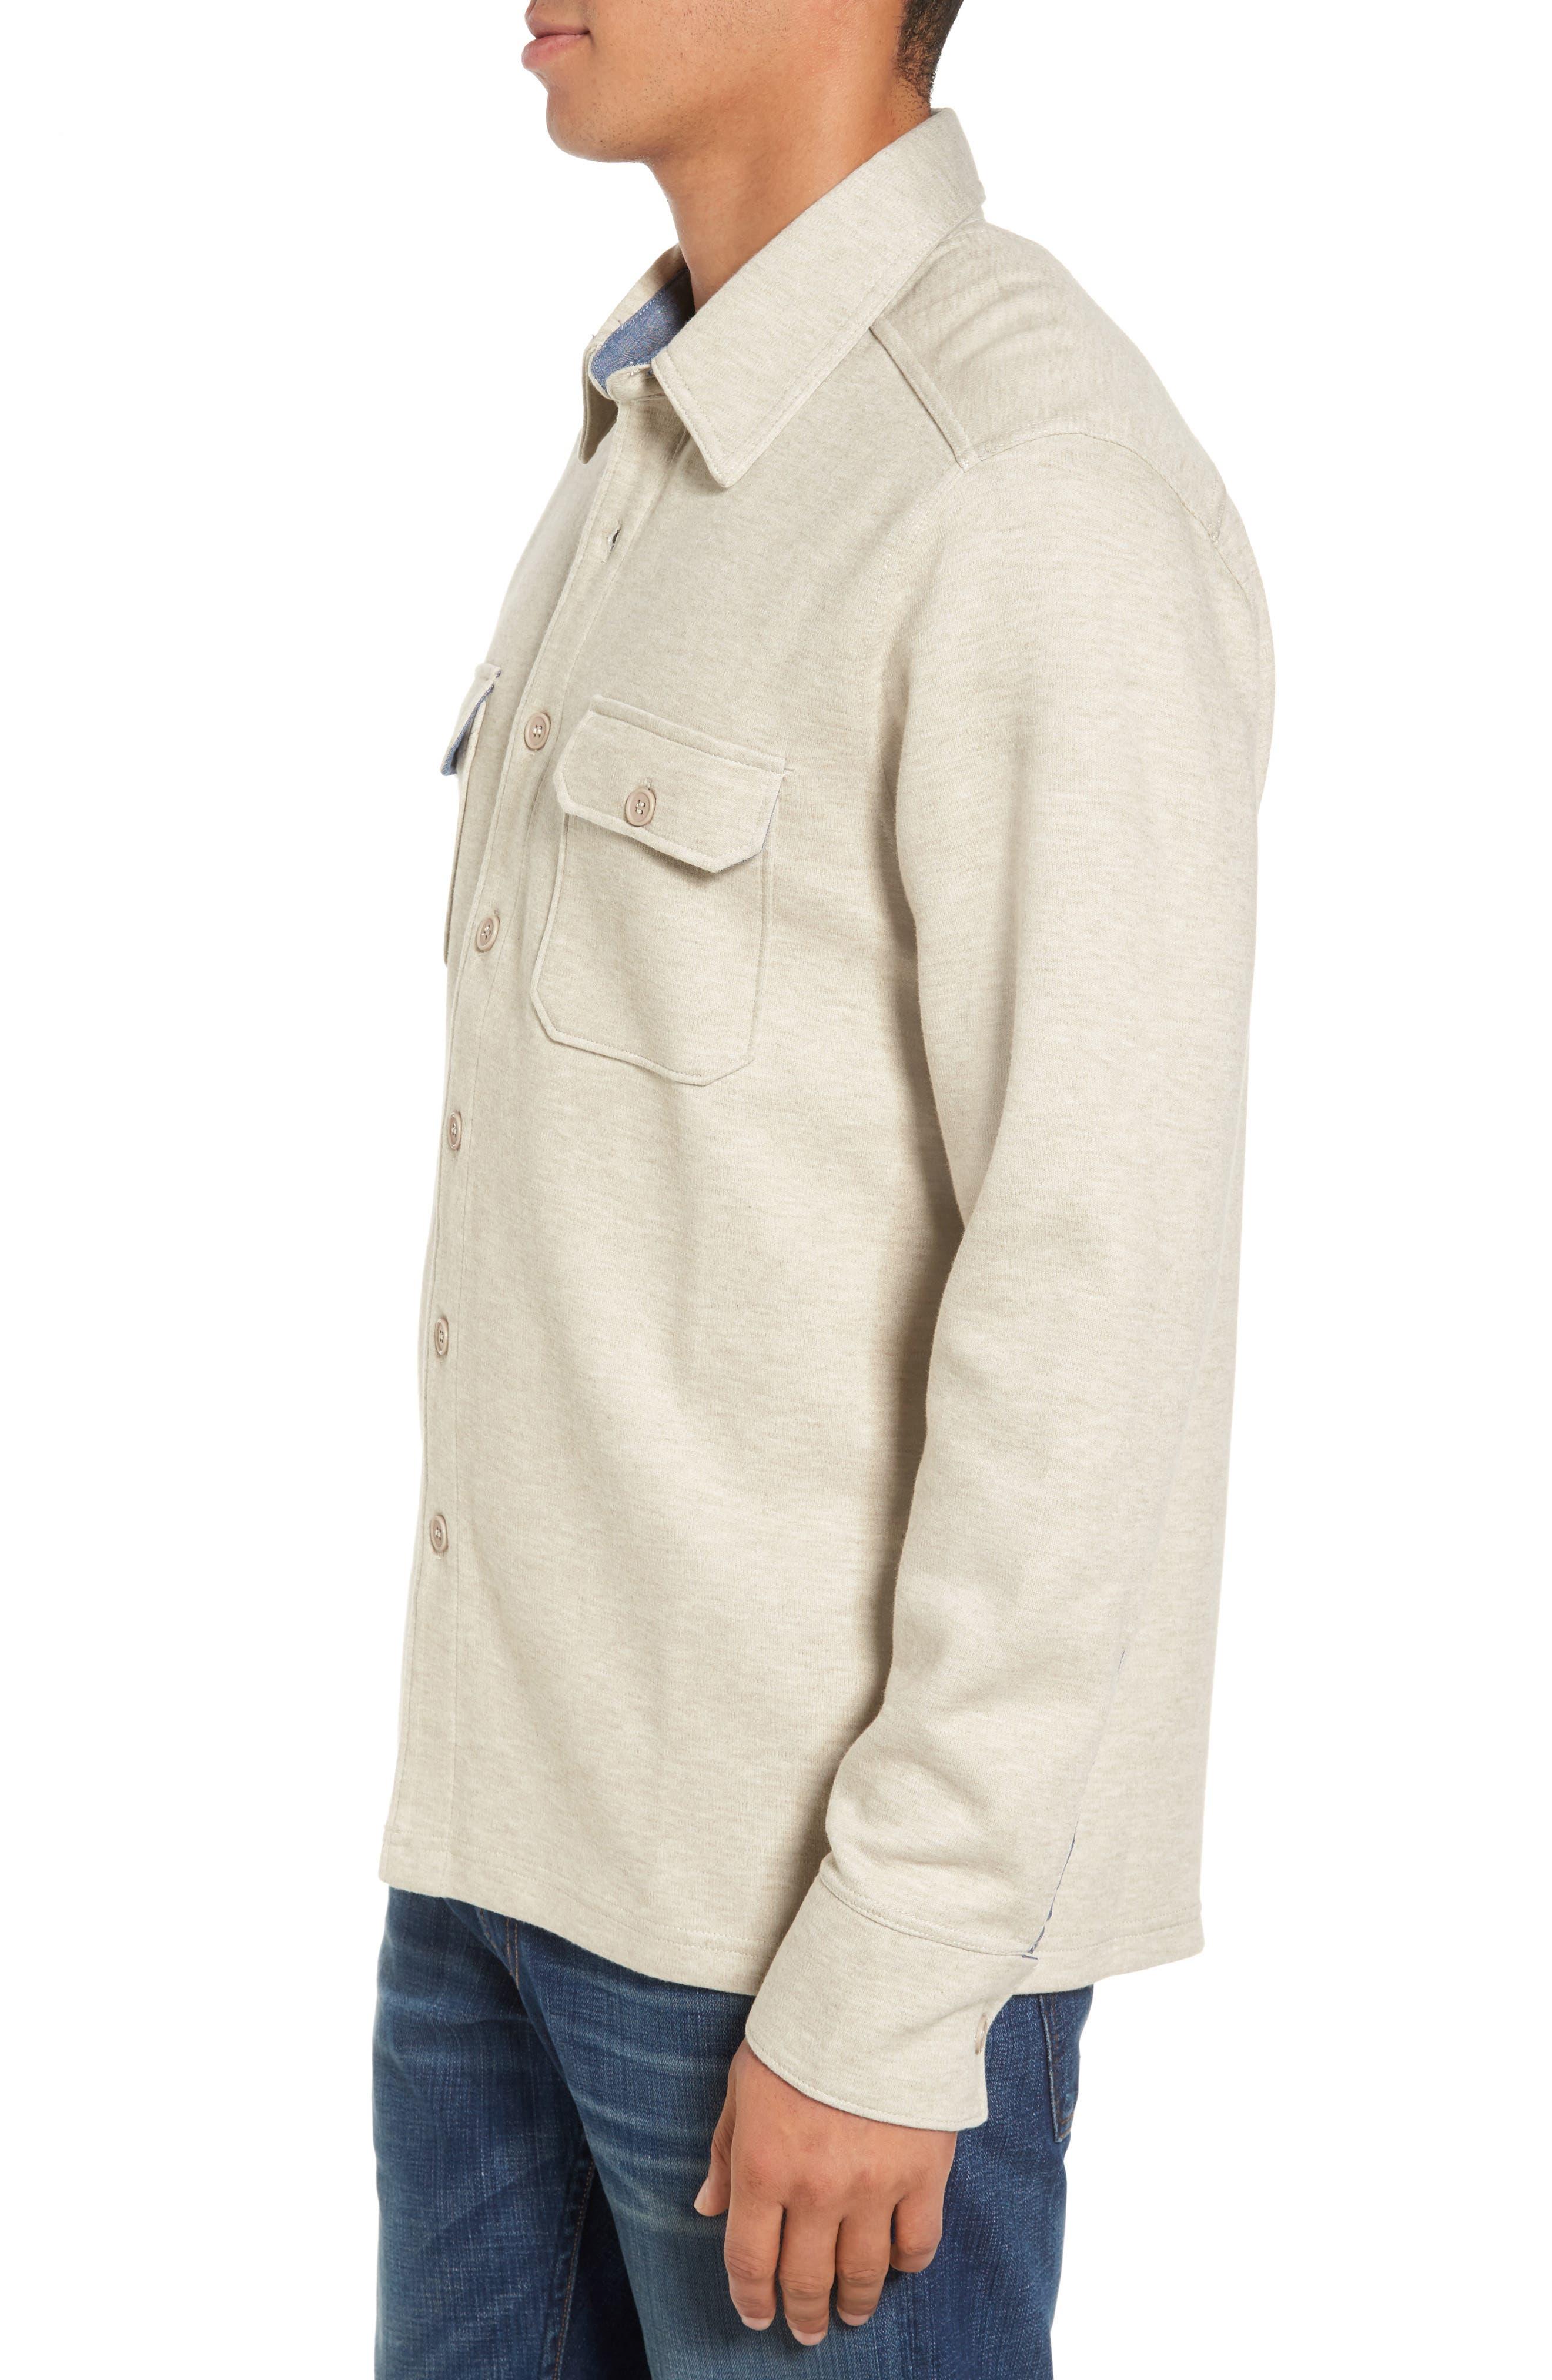 'Longitude' Flap Pocket Fleece Shirt,                             Alternate thumbnail 3, color,                             Bamboo Ivory